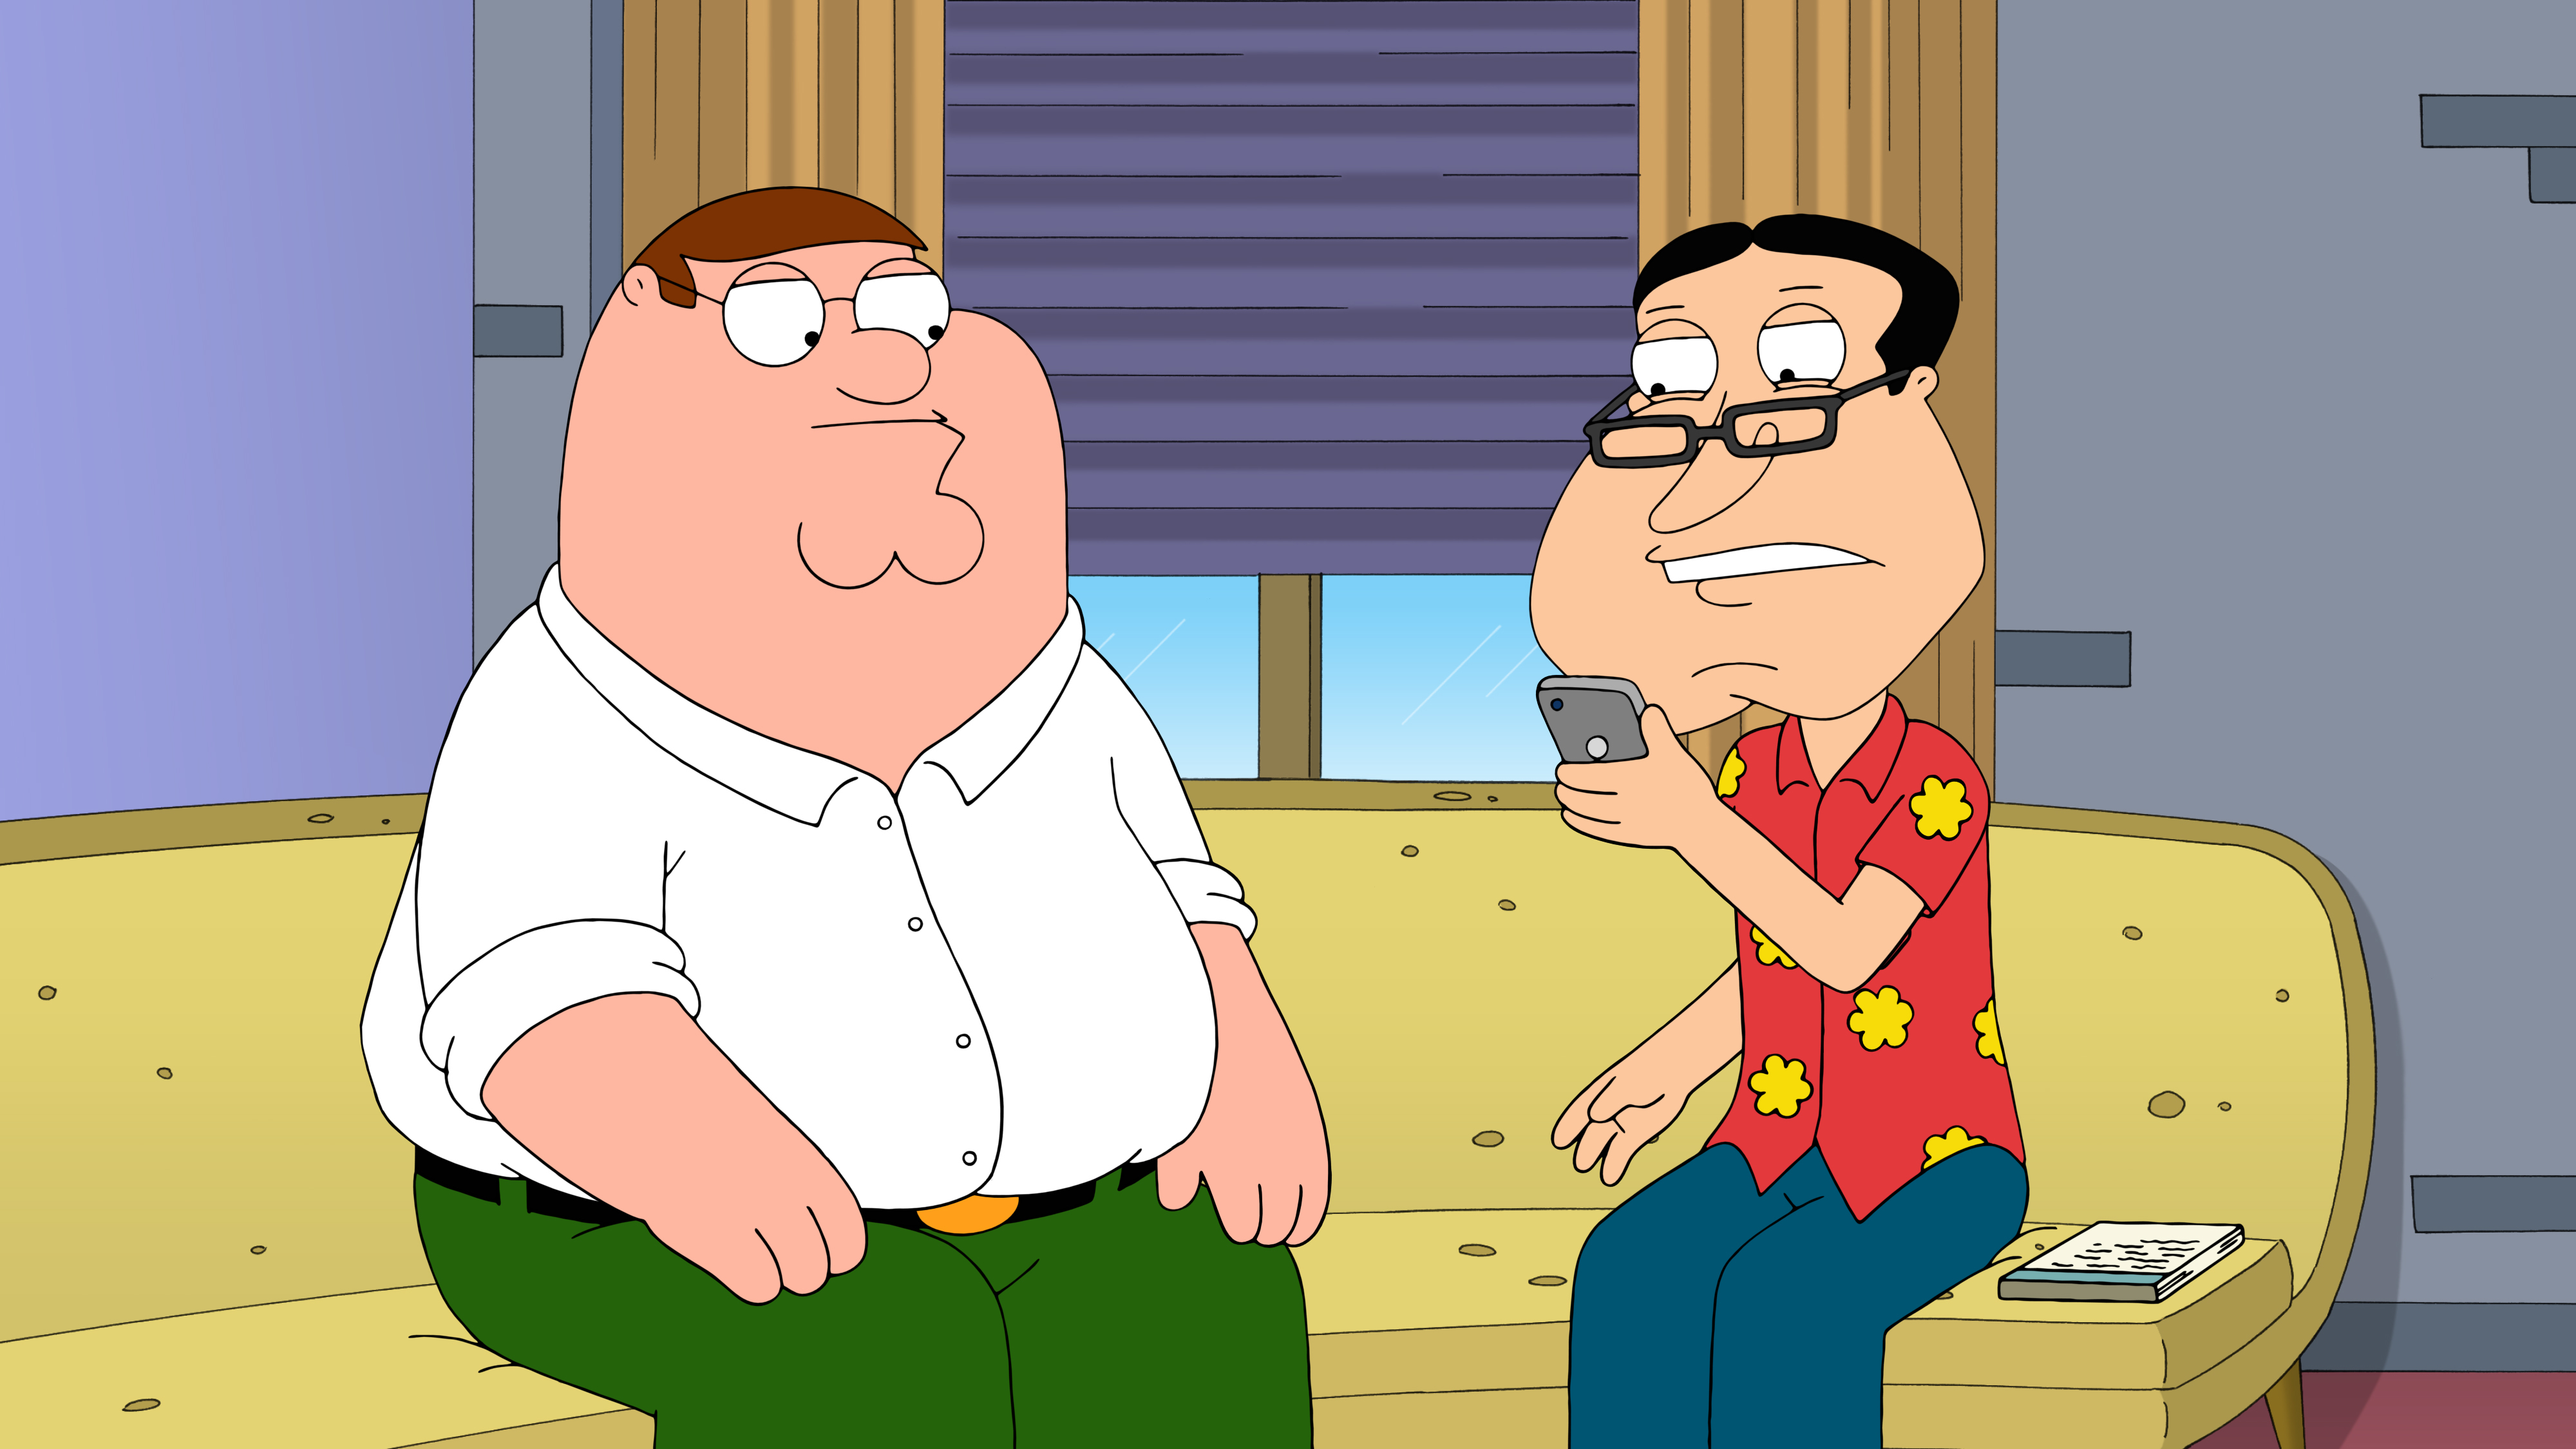 Al Harrington dating Family Guy